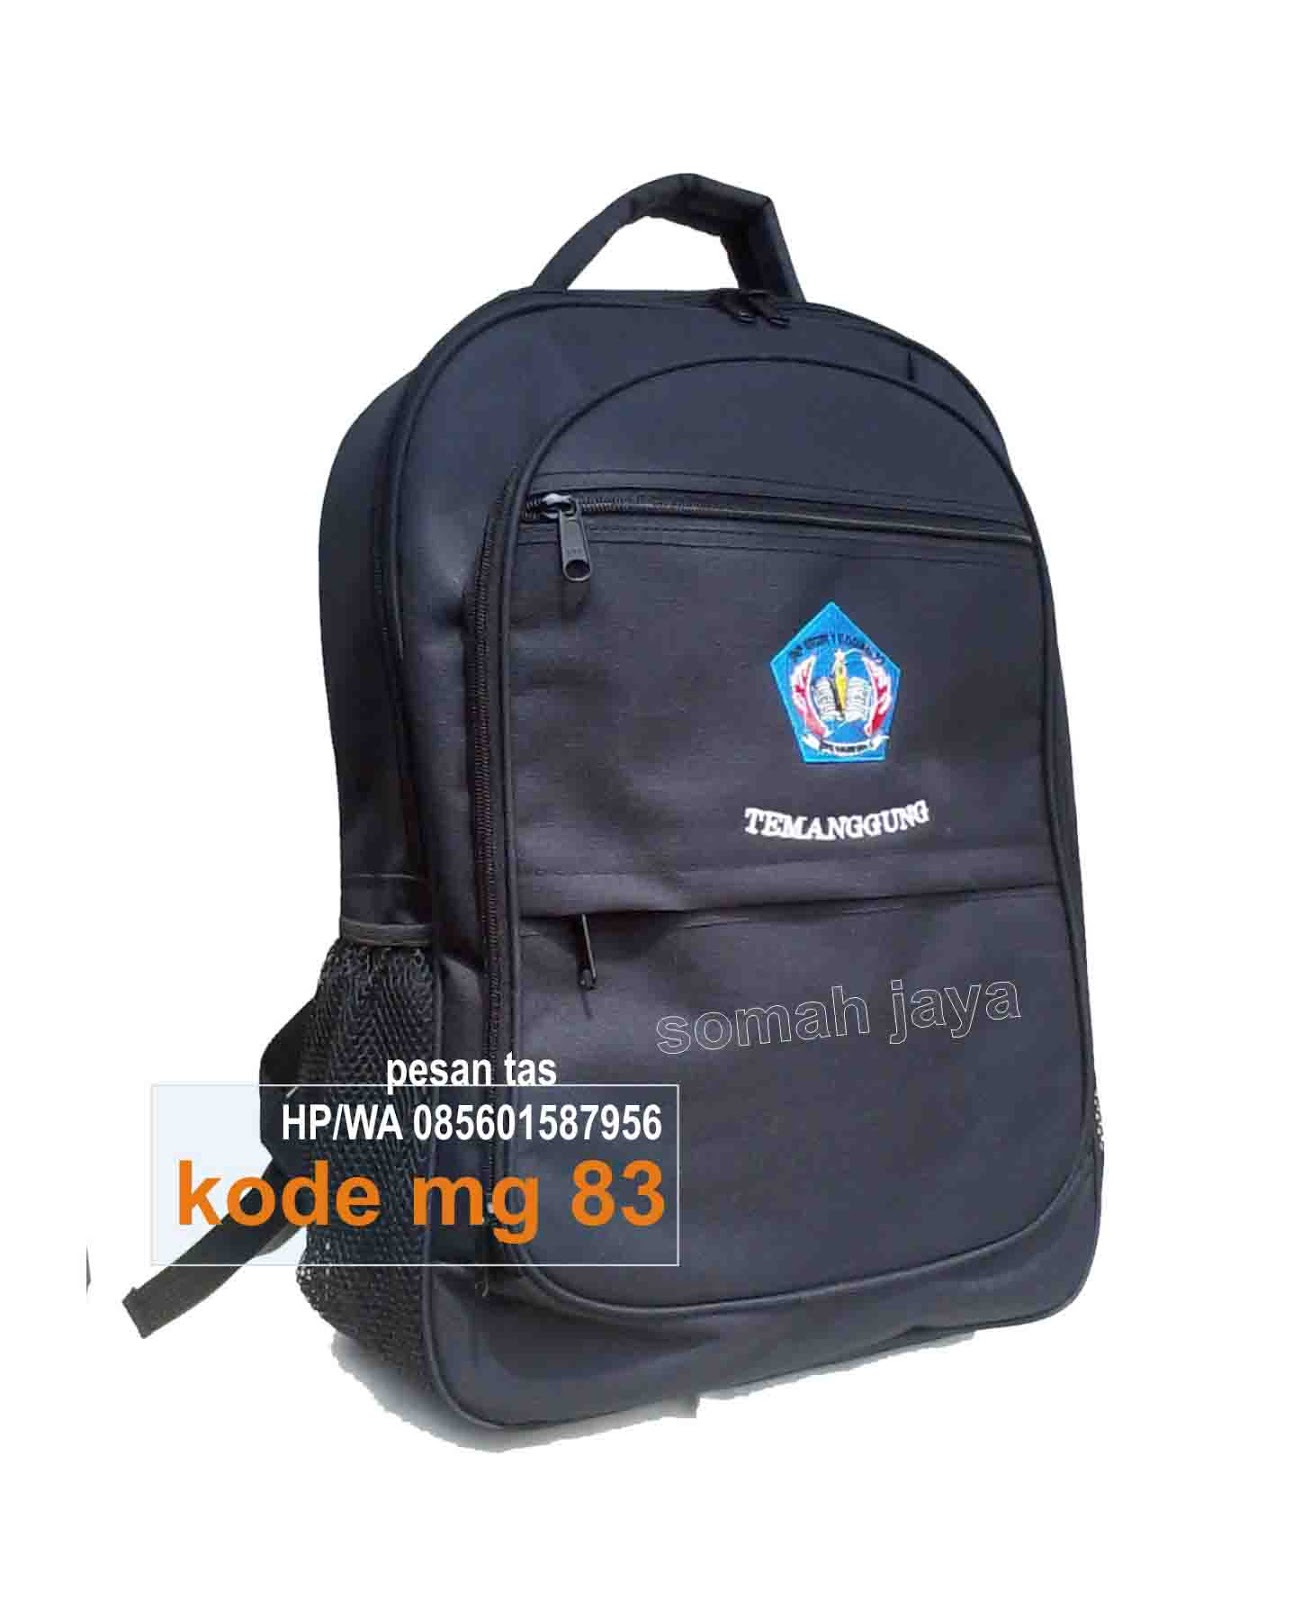 tas ransel laptop tas seminar kit murah tas diklat tas pelatihan tas dinas  tas sekolah 6119c2b506